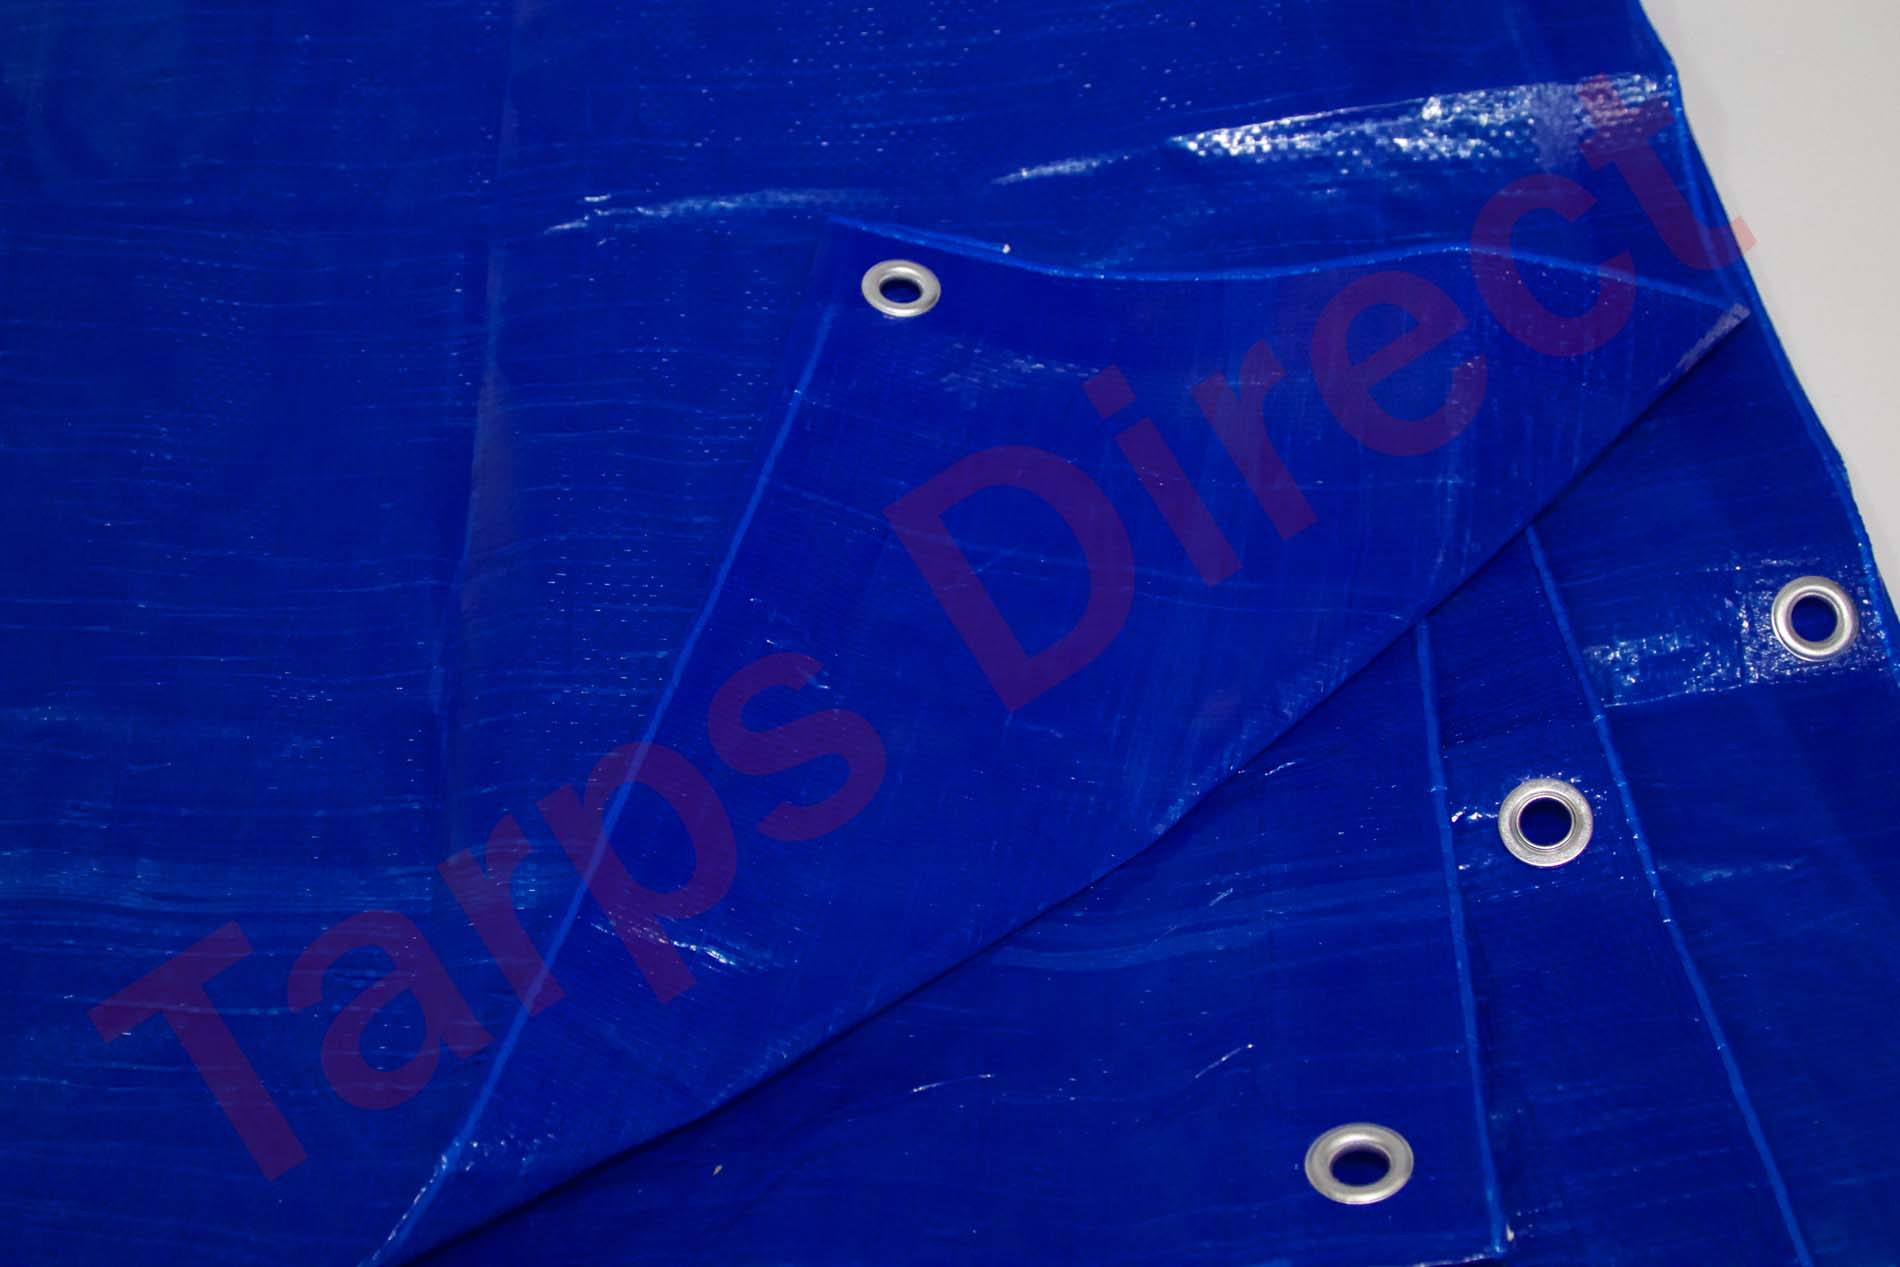 Harpster Tarps 15 ft x 25 ft BLUE Tarp - 2.9 oz. Economy Lightweight Cover Waterproof